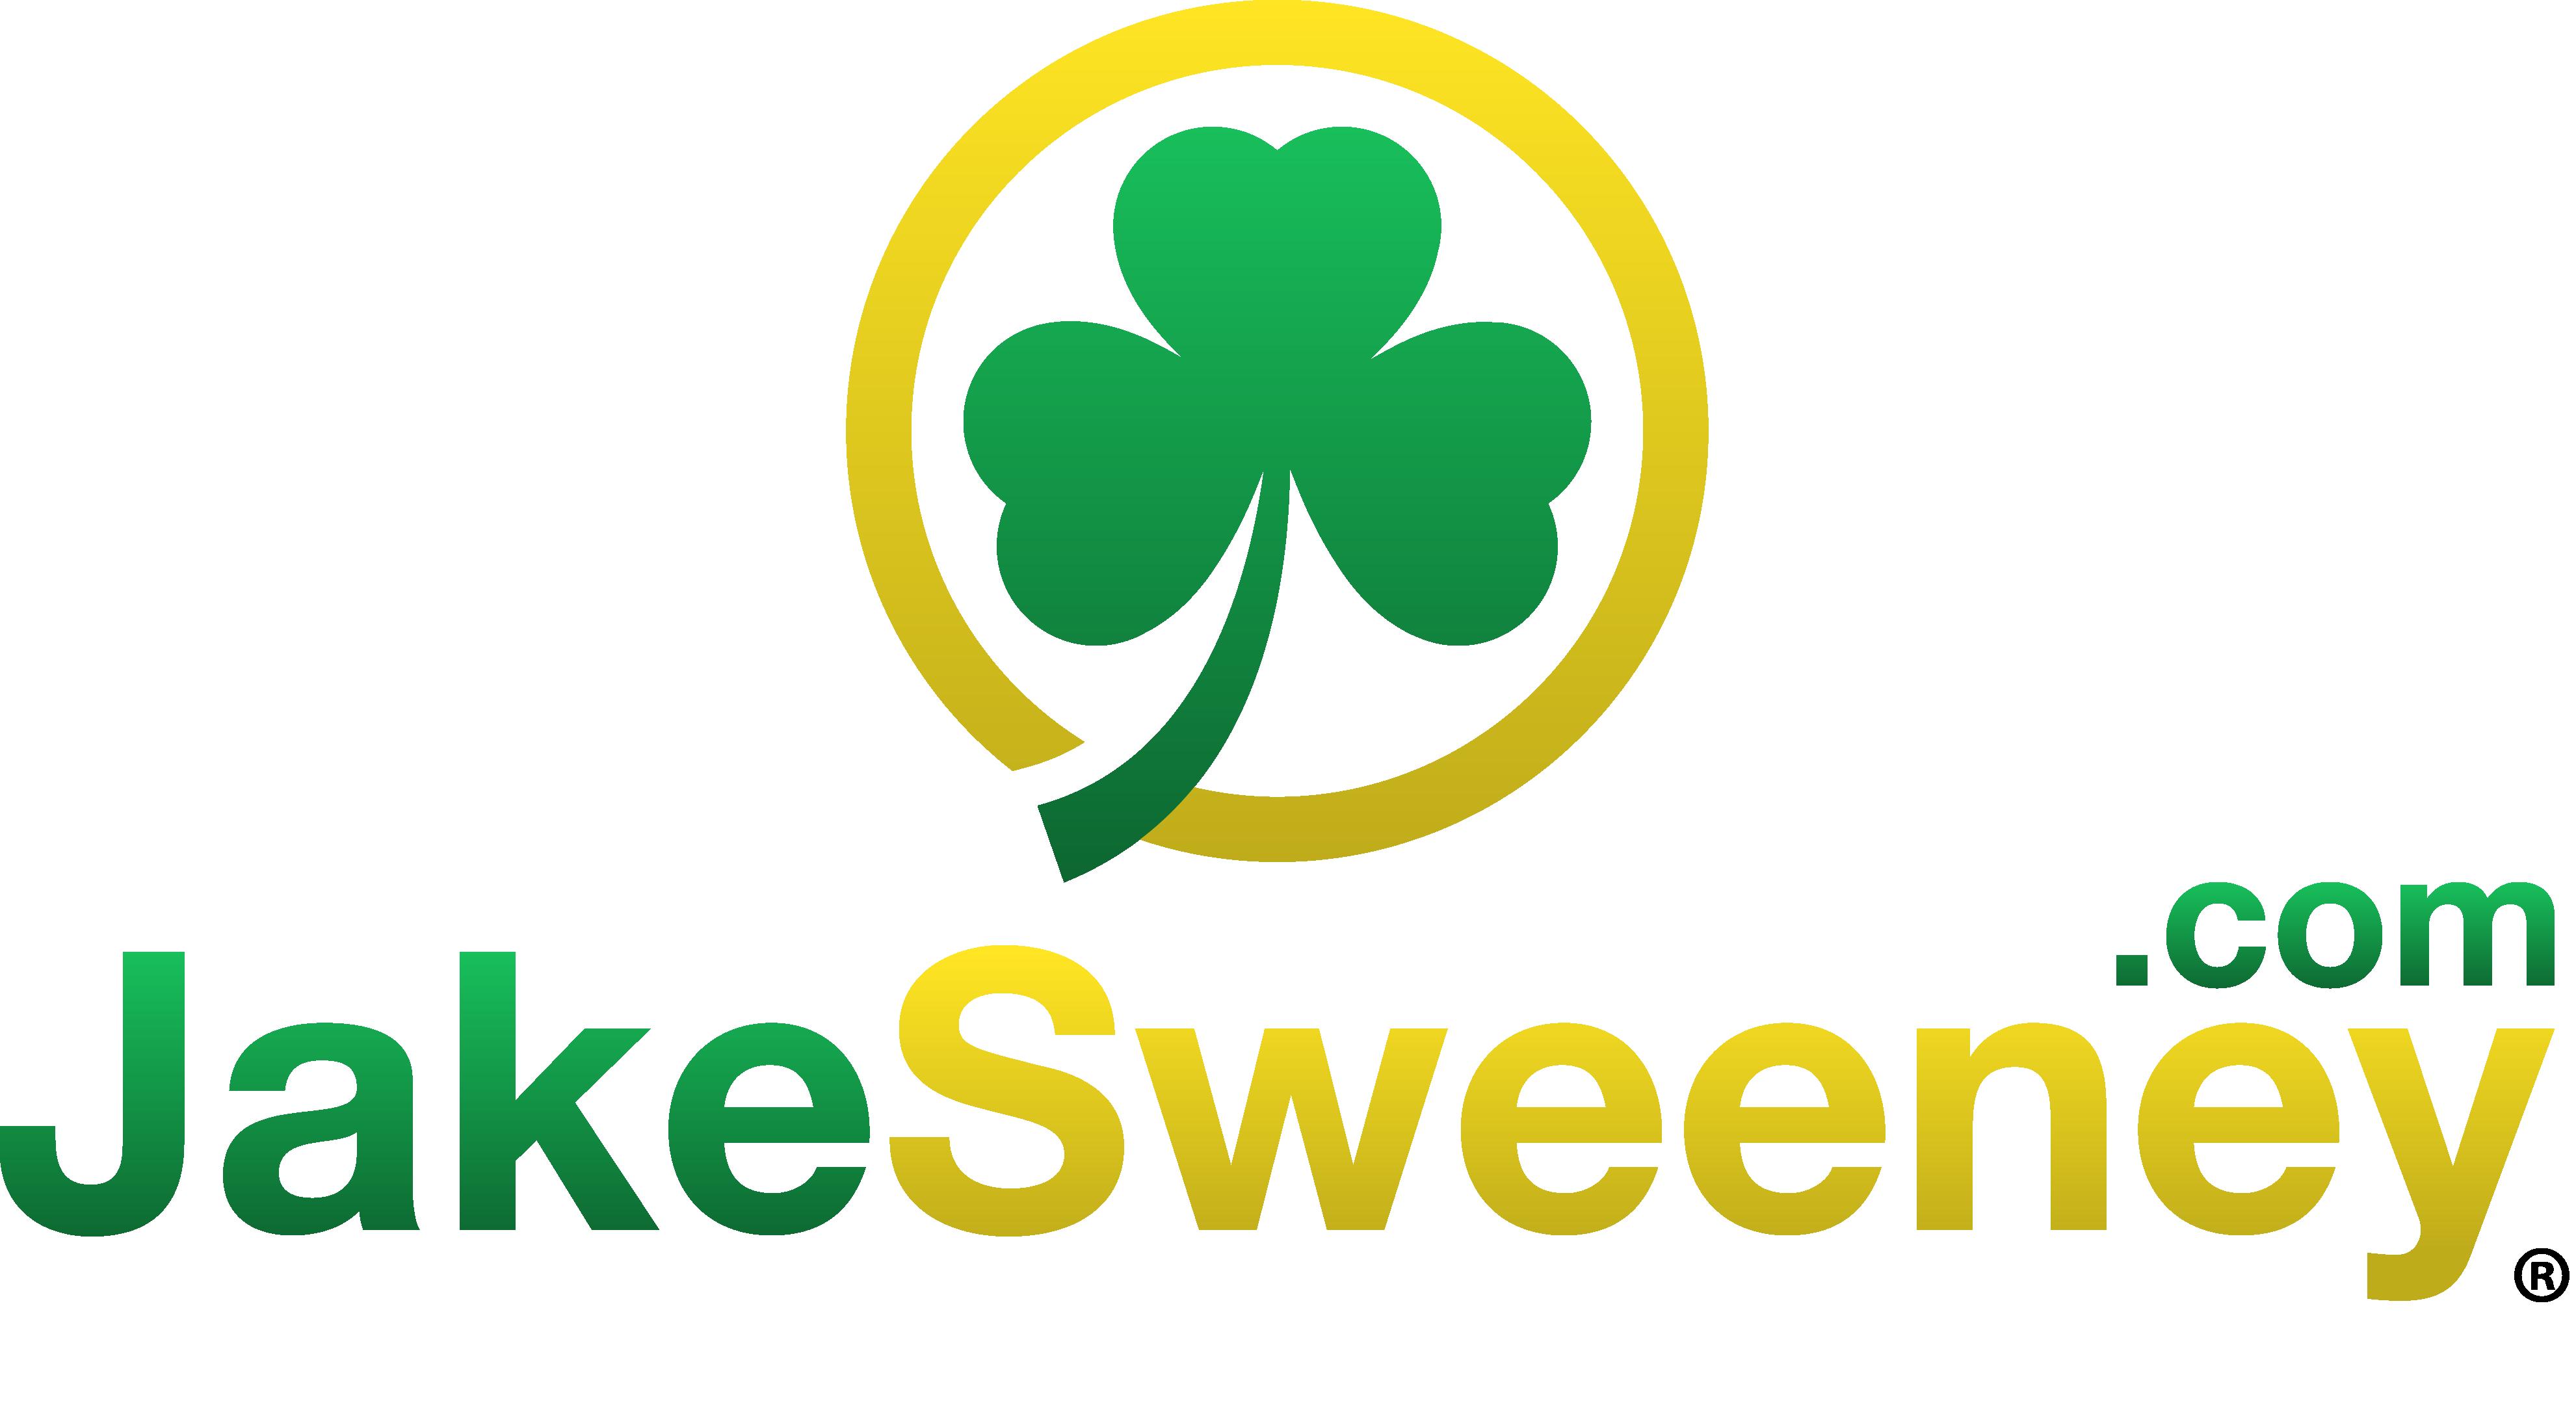 Jake Sweeney Mazda >> Jake Sweeney Mazda West New Mazda Dealership In Cincinnati Oh 45238